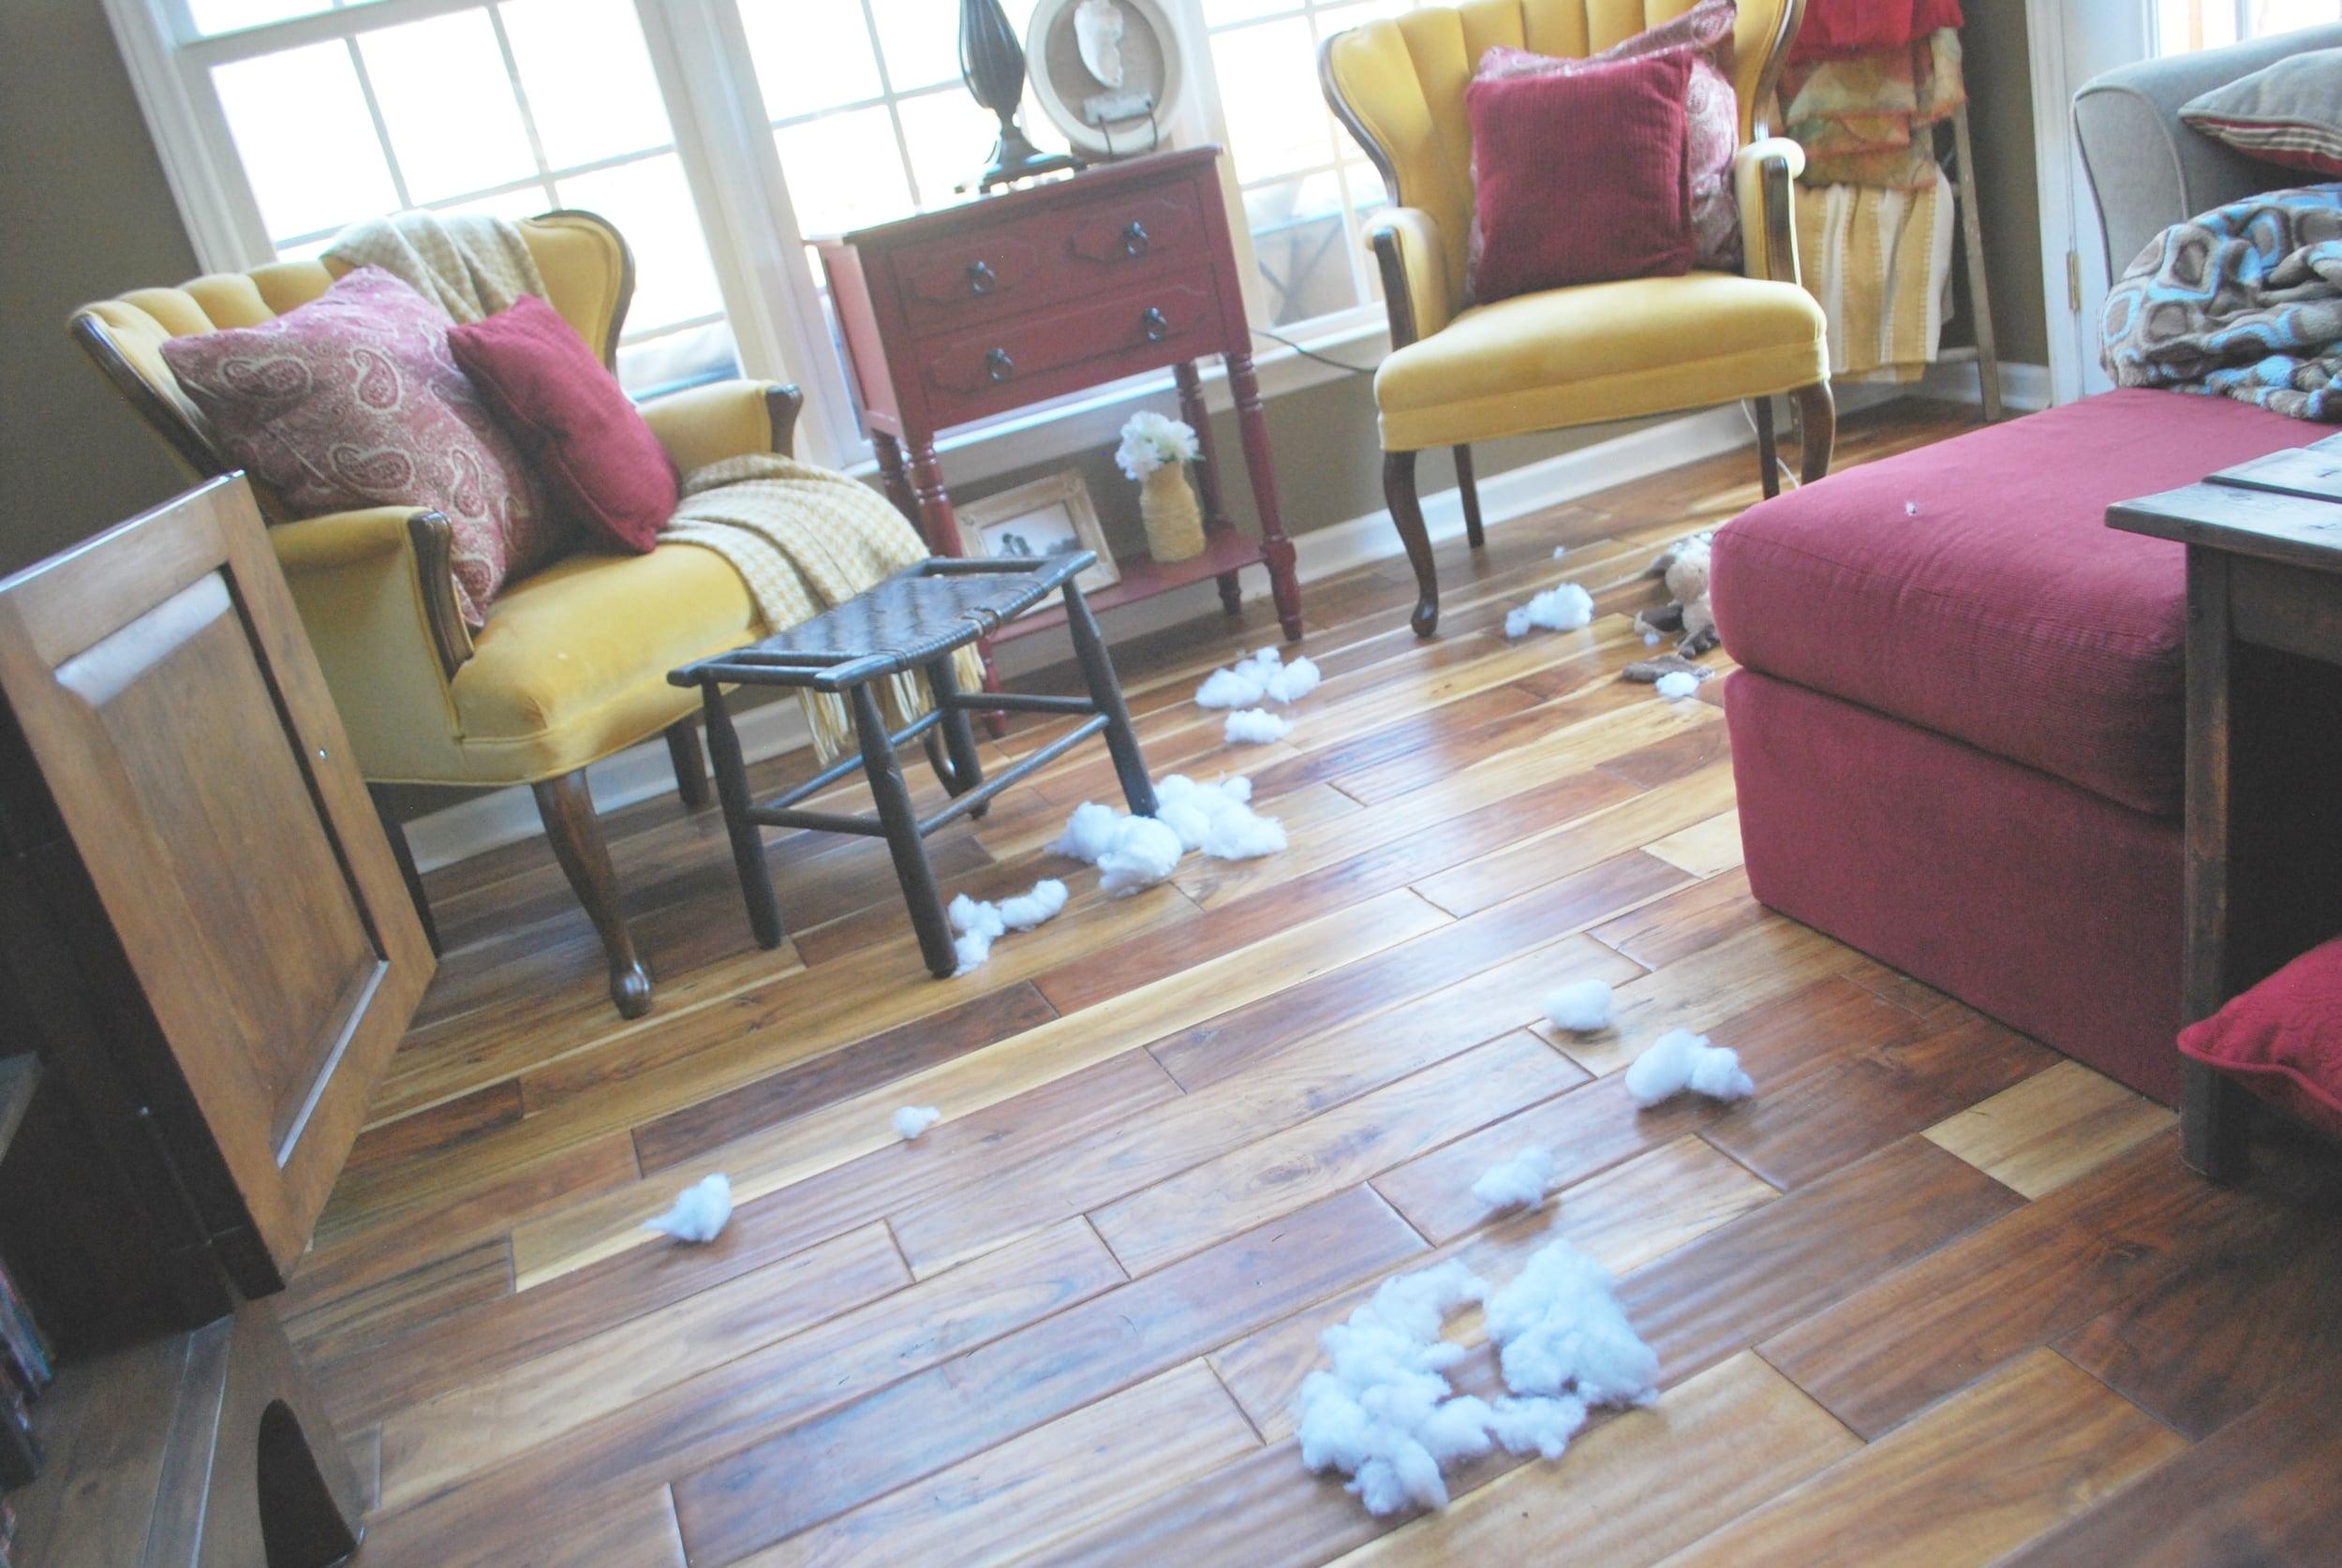 Dog toy stuffing everywhere...